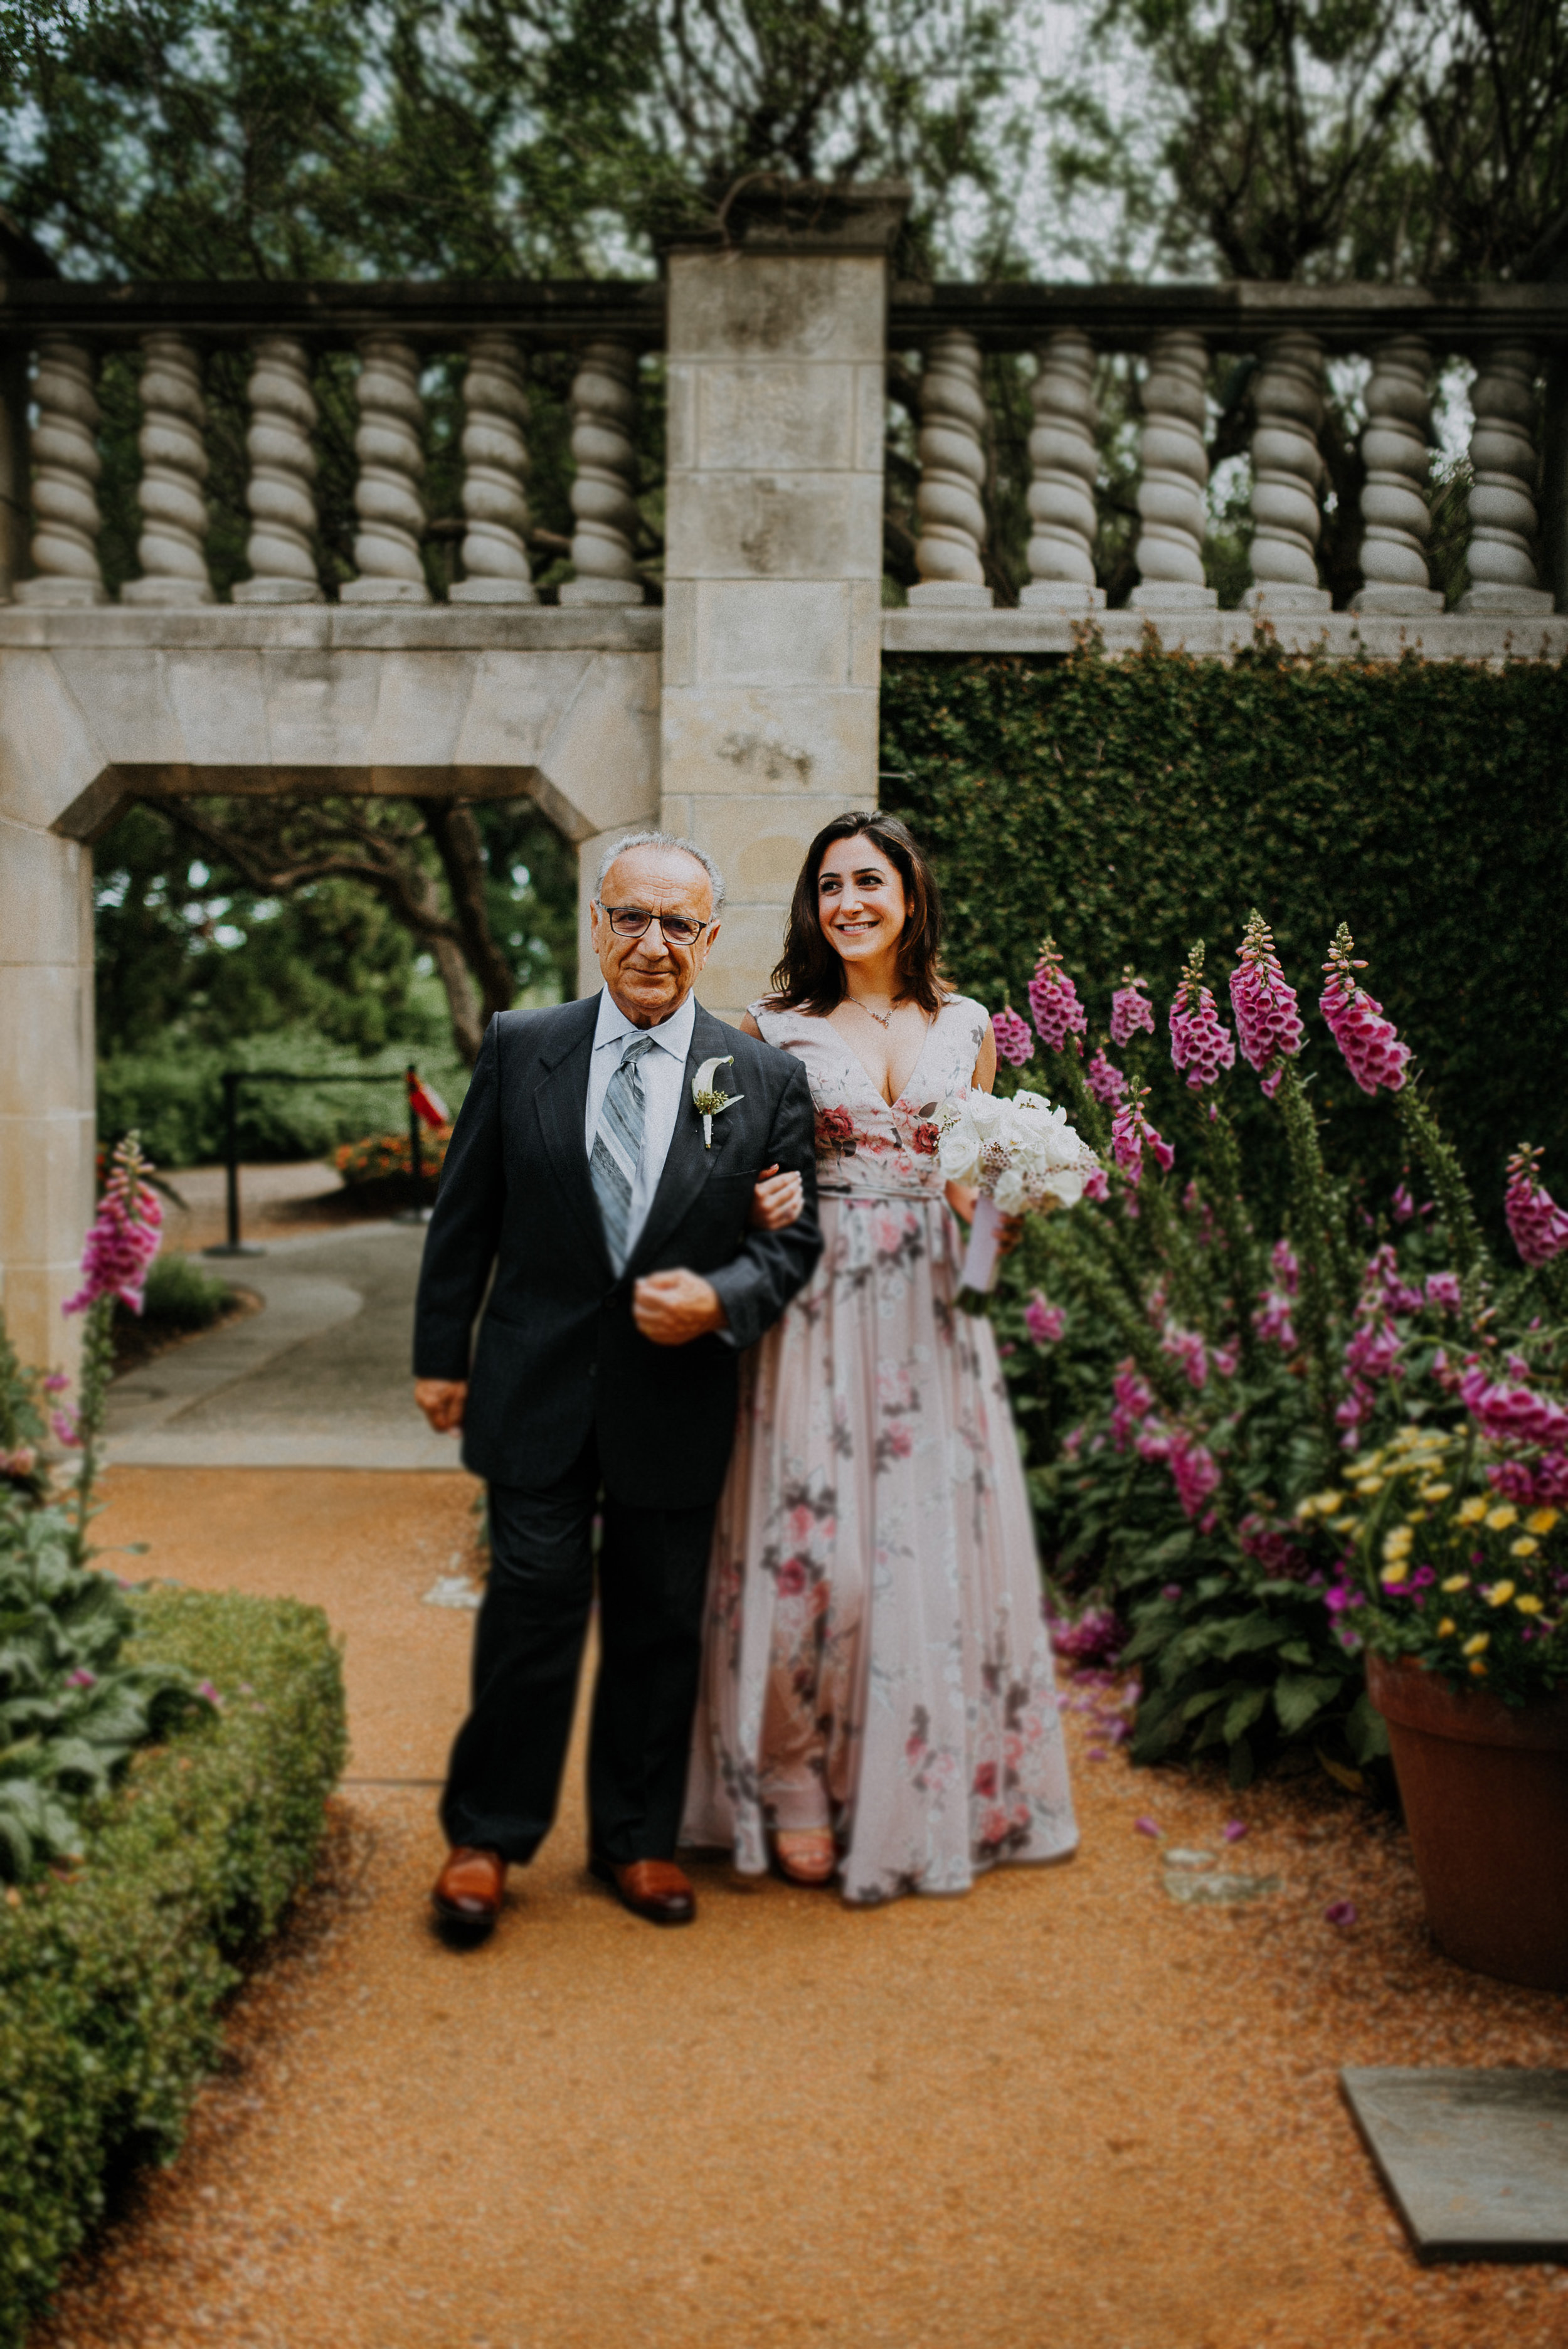 Dallas-fort-worth-wedding-photographer-dallas-arboretum-intimate-wedding-dallas-texas-06